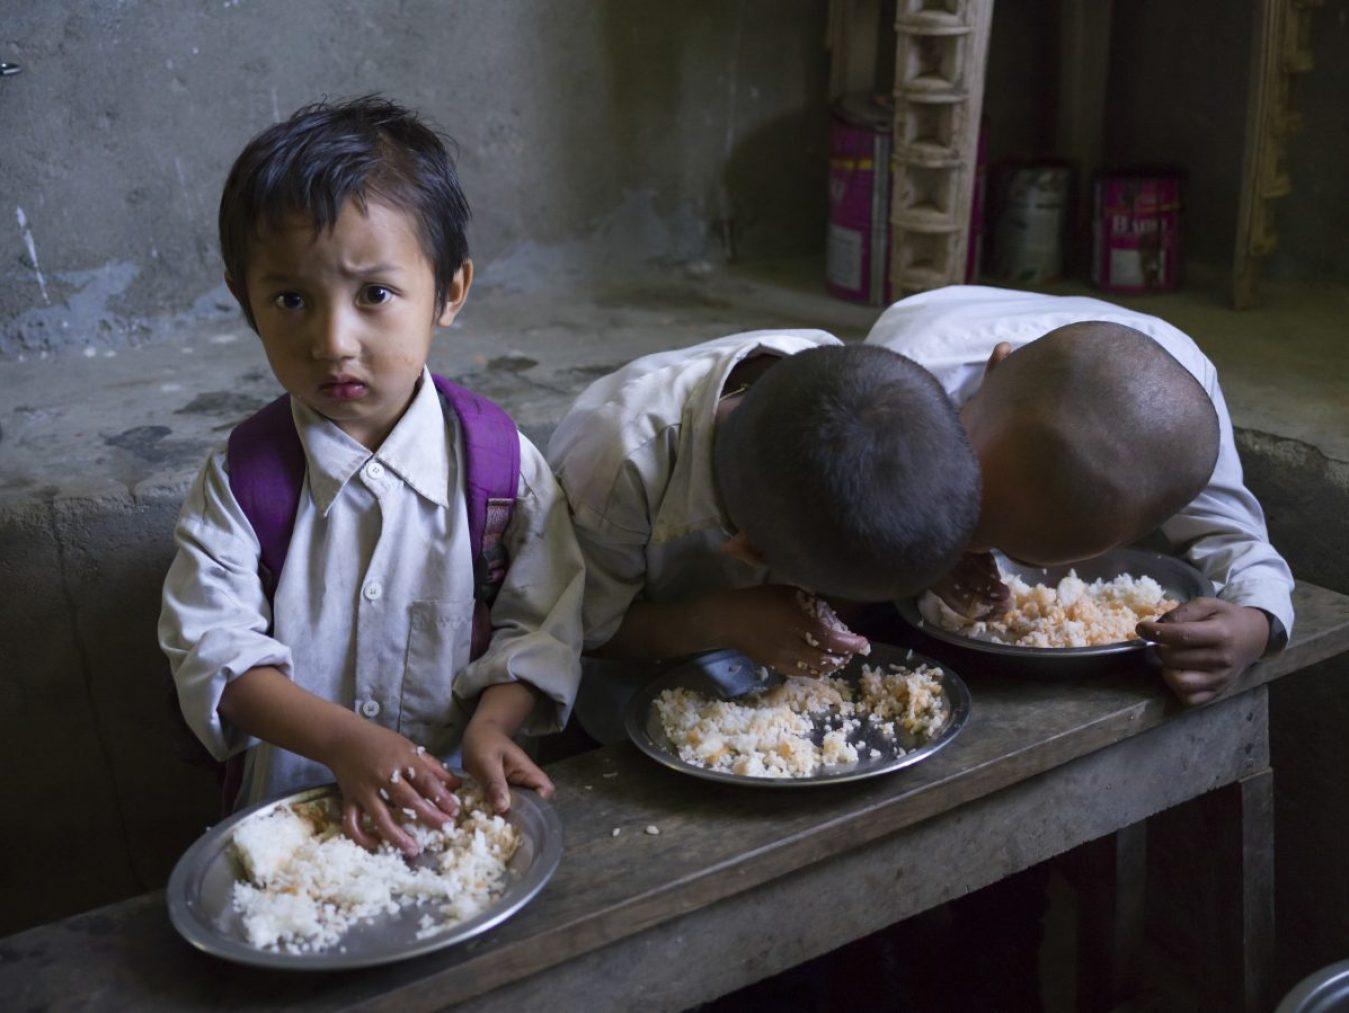 children. School children having mid-day meal in school, Radhu Khandu Village, Sikkim, India. Image credit: Keith Levit / 123rf. Hunger starvation concept.